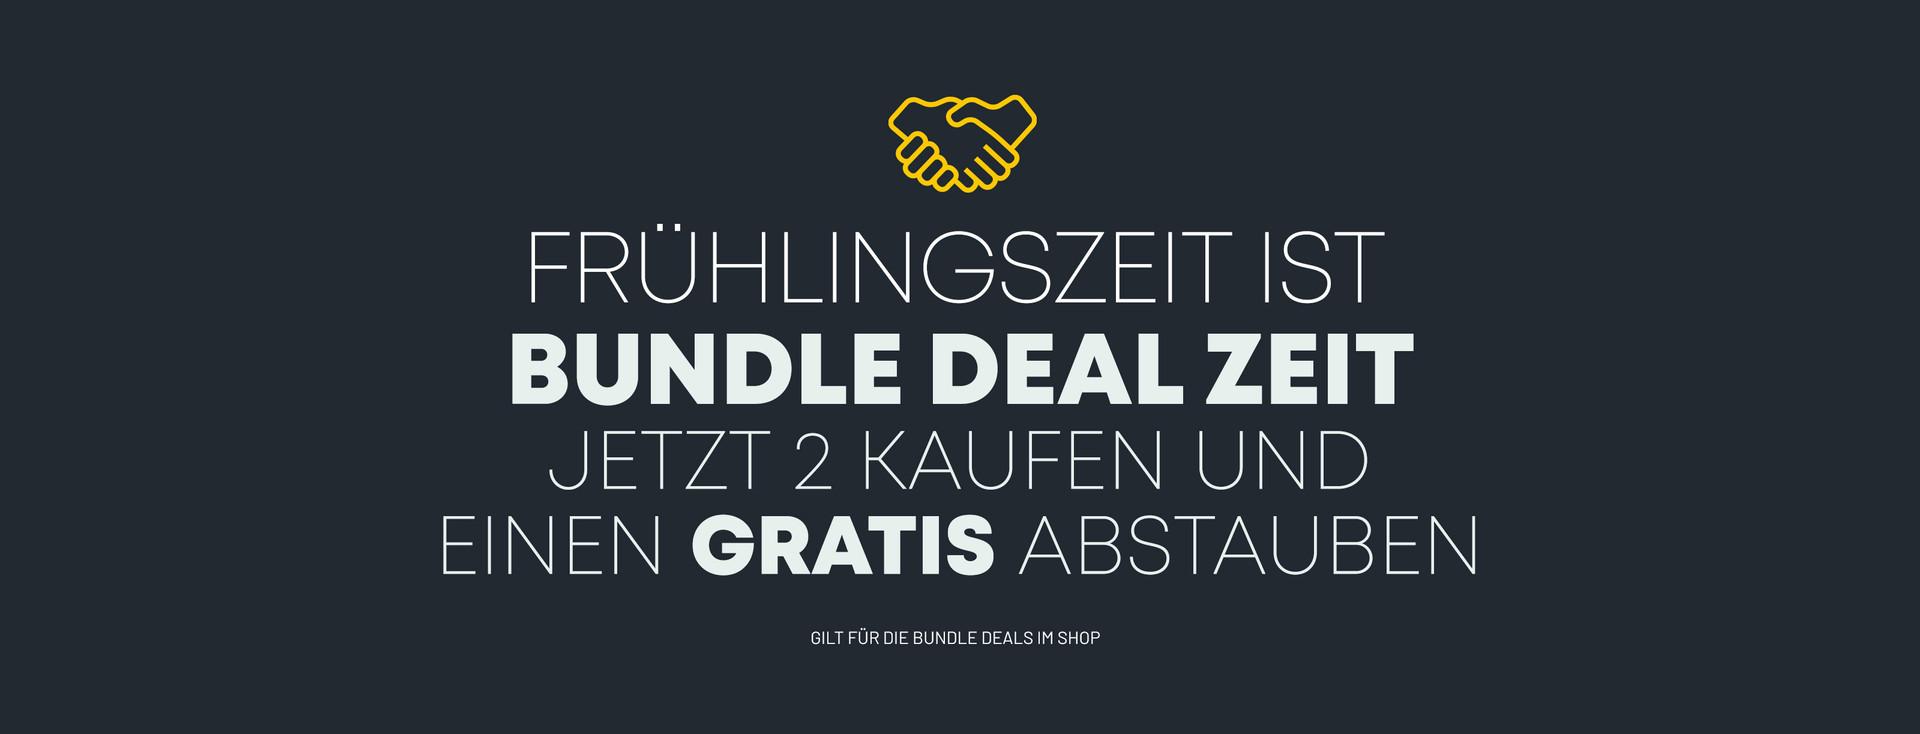 eScooter Görlitz Bundle Deals